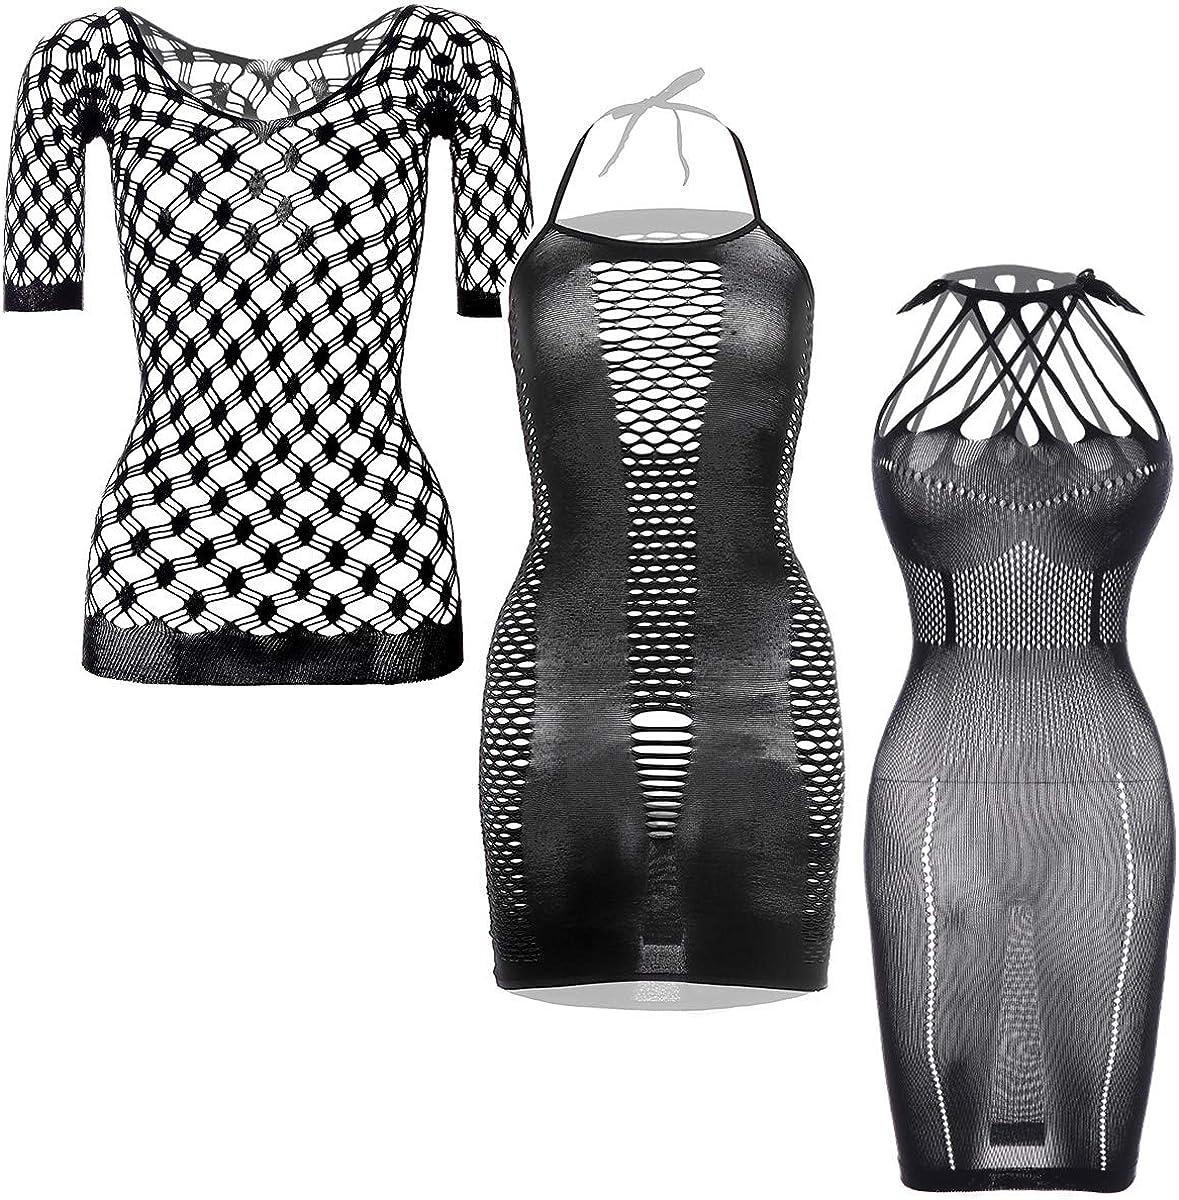 GVIANCXI 3 Pack Women Mini Dresses Sexy Out Super special price Under blast sales Bodysui Cut Seamless